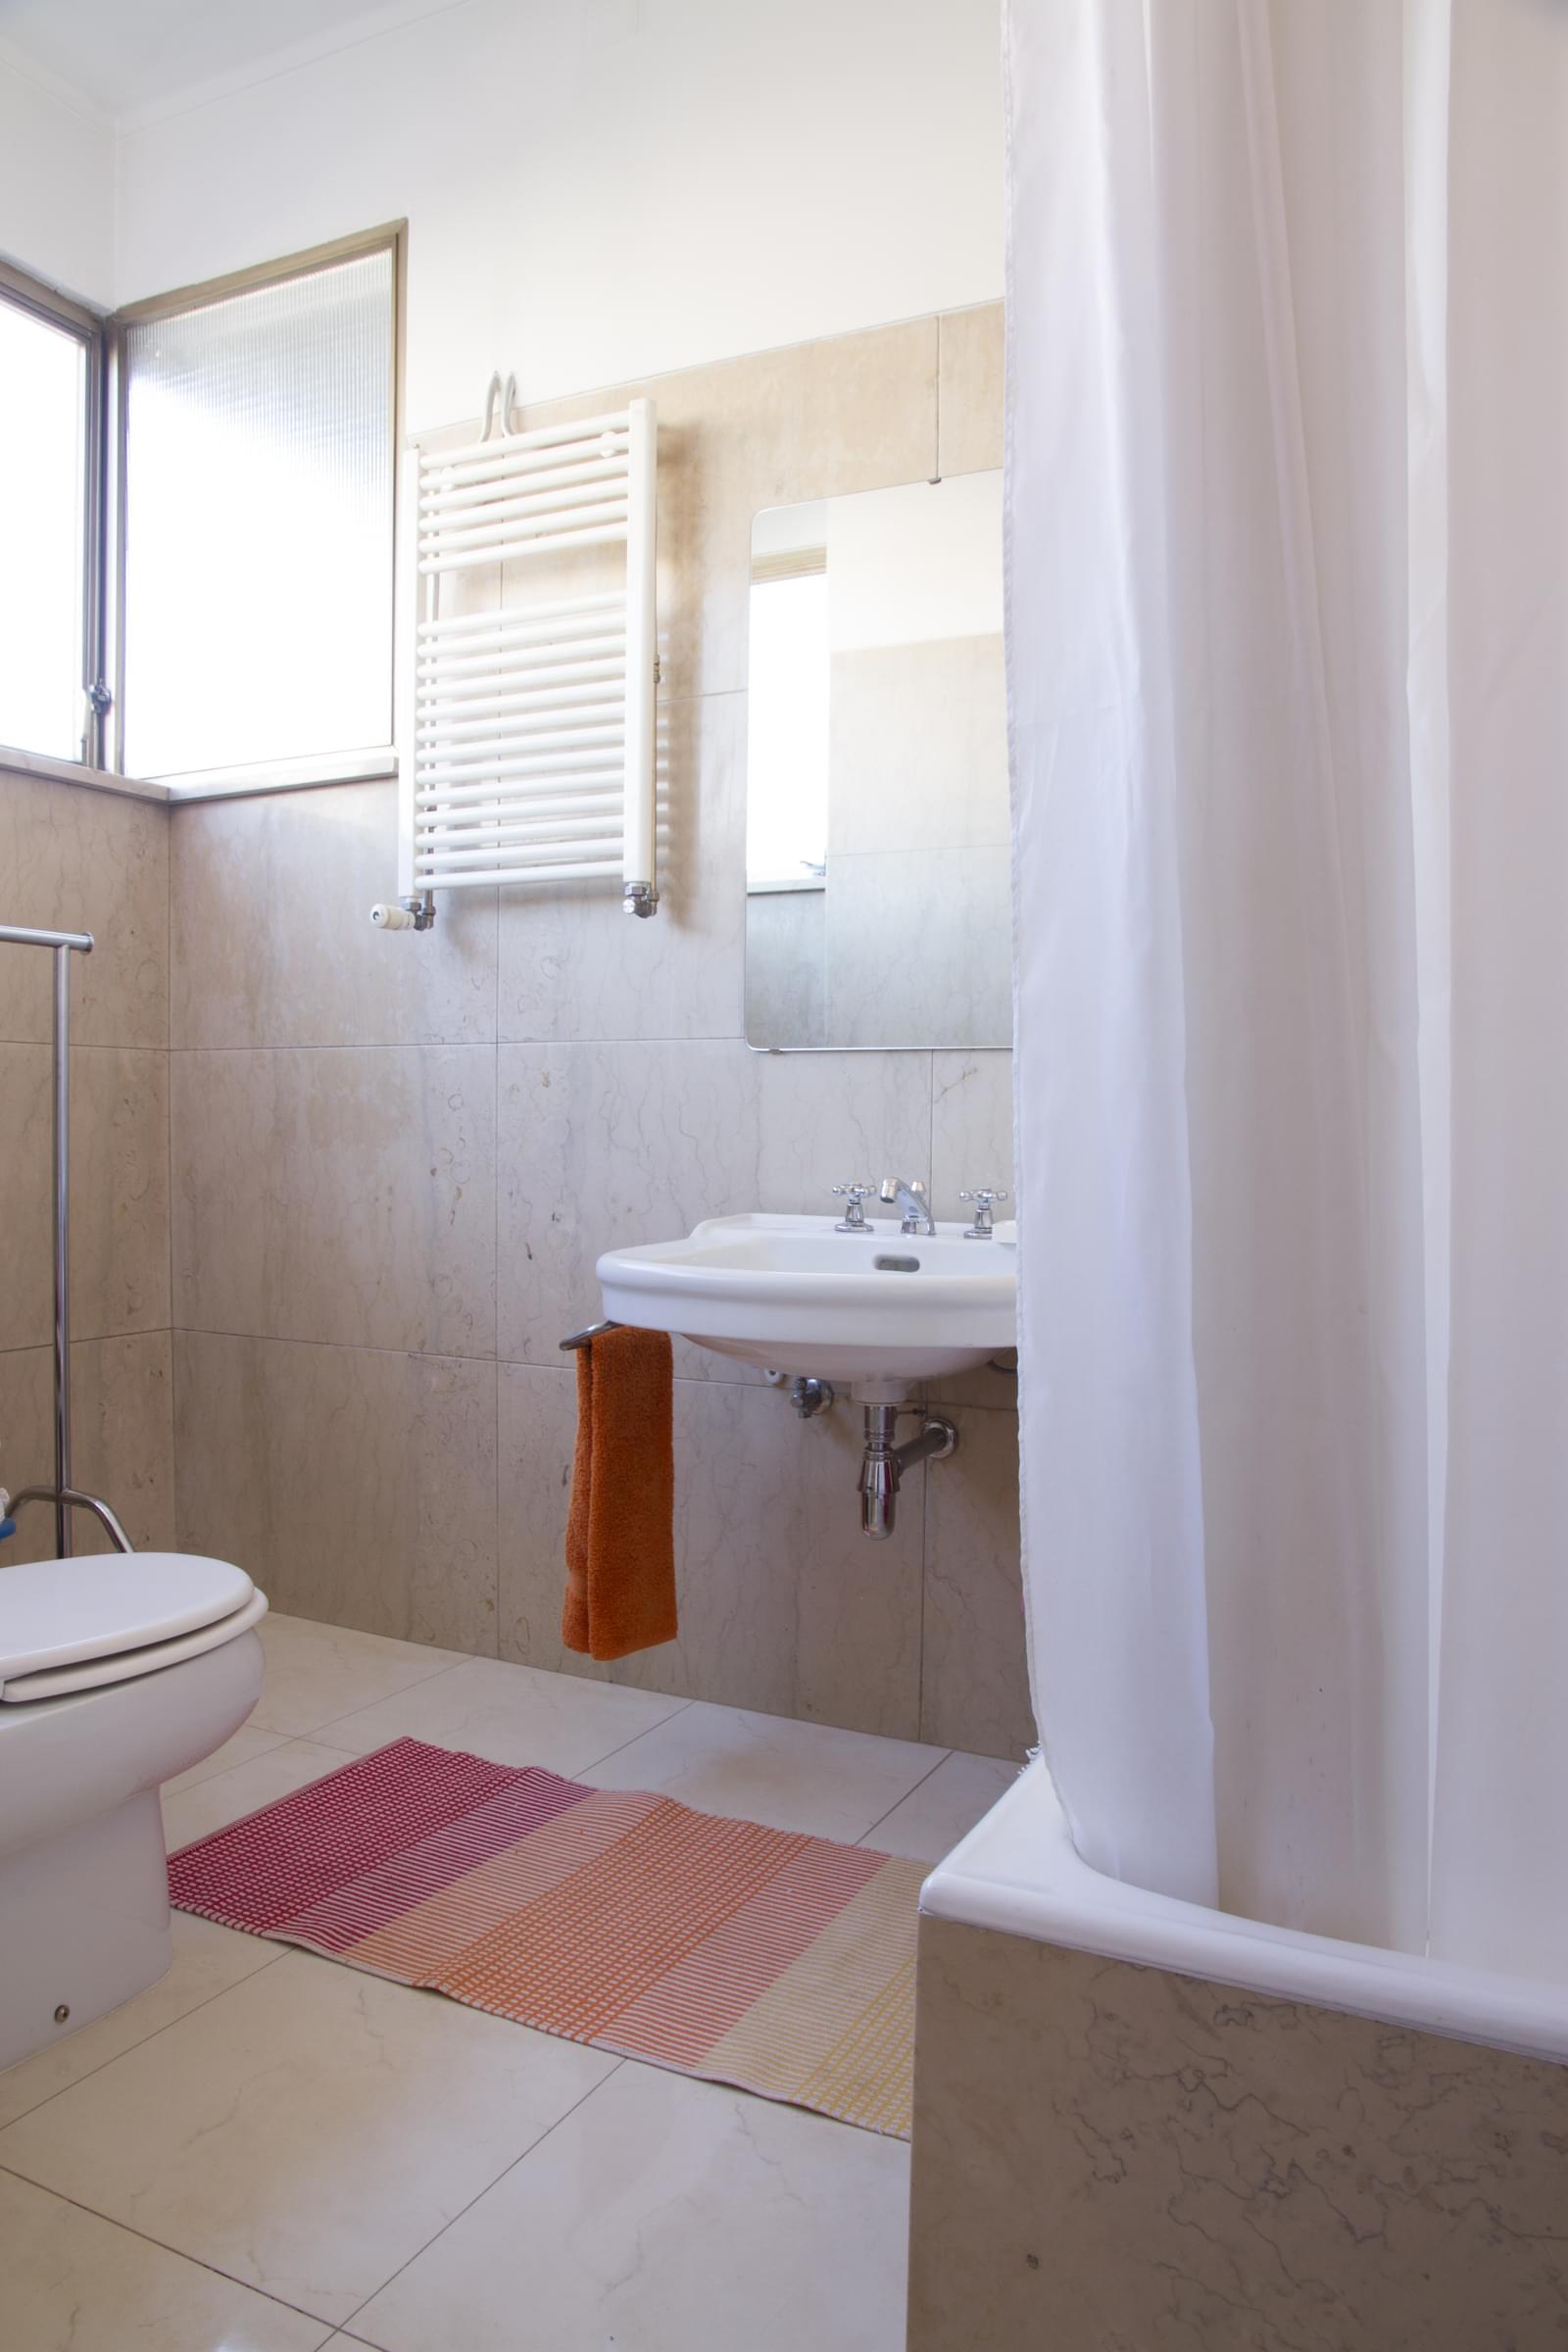 pf18175-apartamento-t5-lisboa-b1b1ce2c-08a8-4531-b8ed-bd2499e07d7a